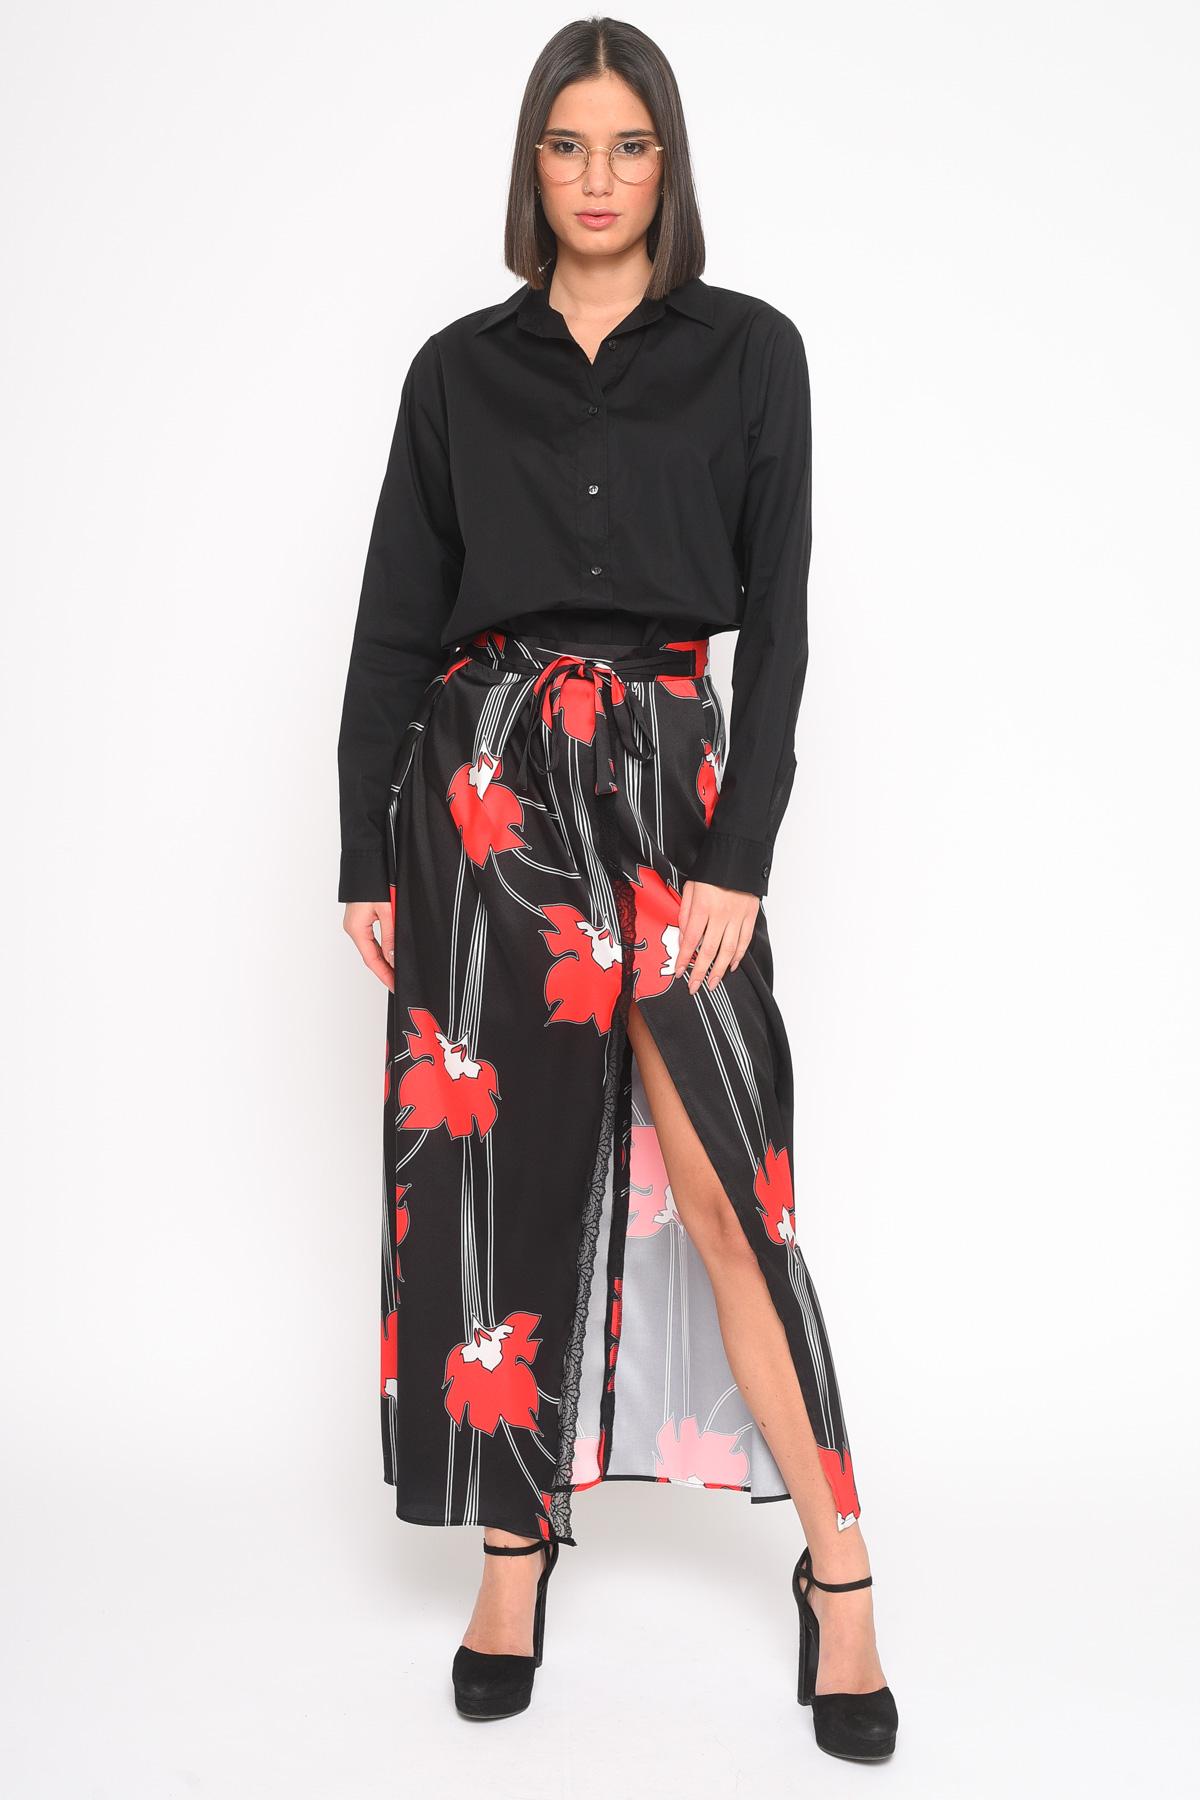 GONNA RASO IN FANTASIA CON SPACCO for women - ONLY - Paquito Pronto Moda Shop Online